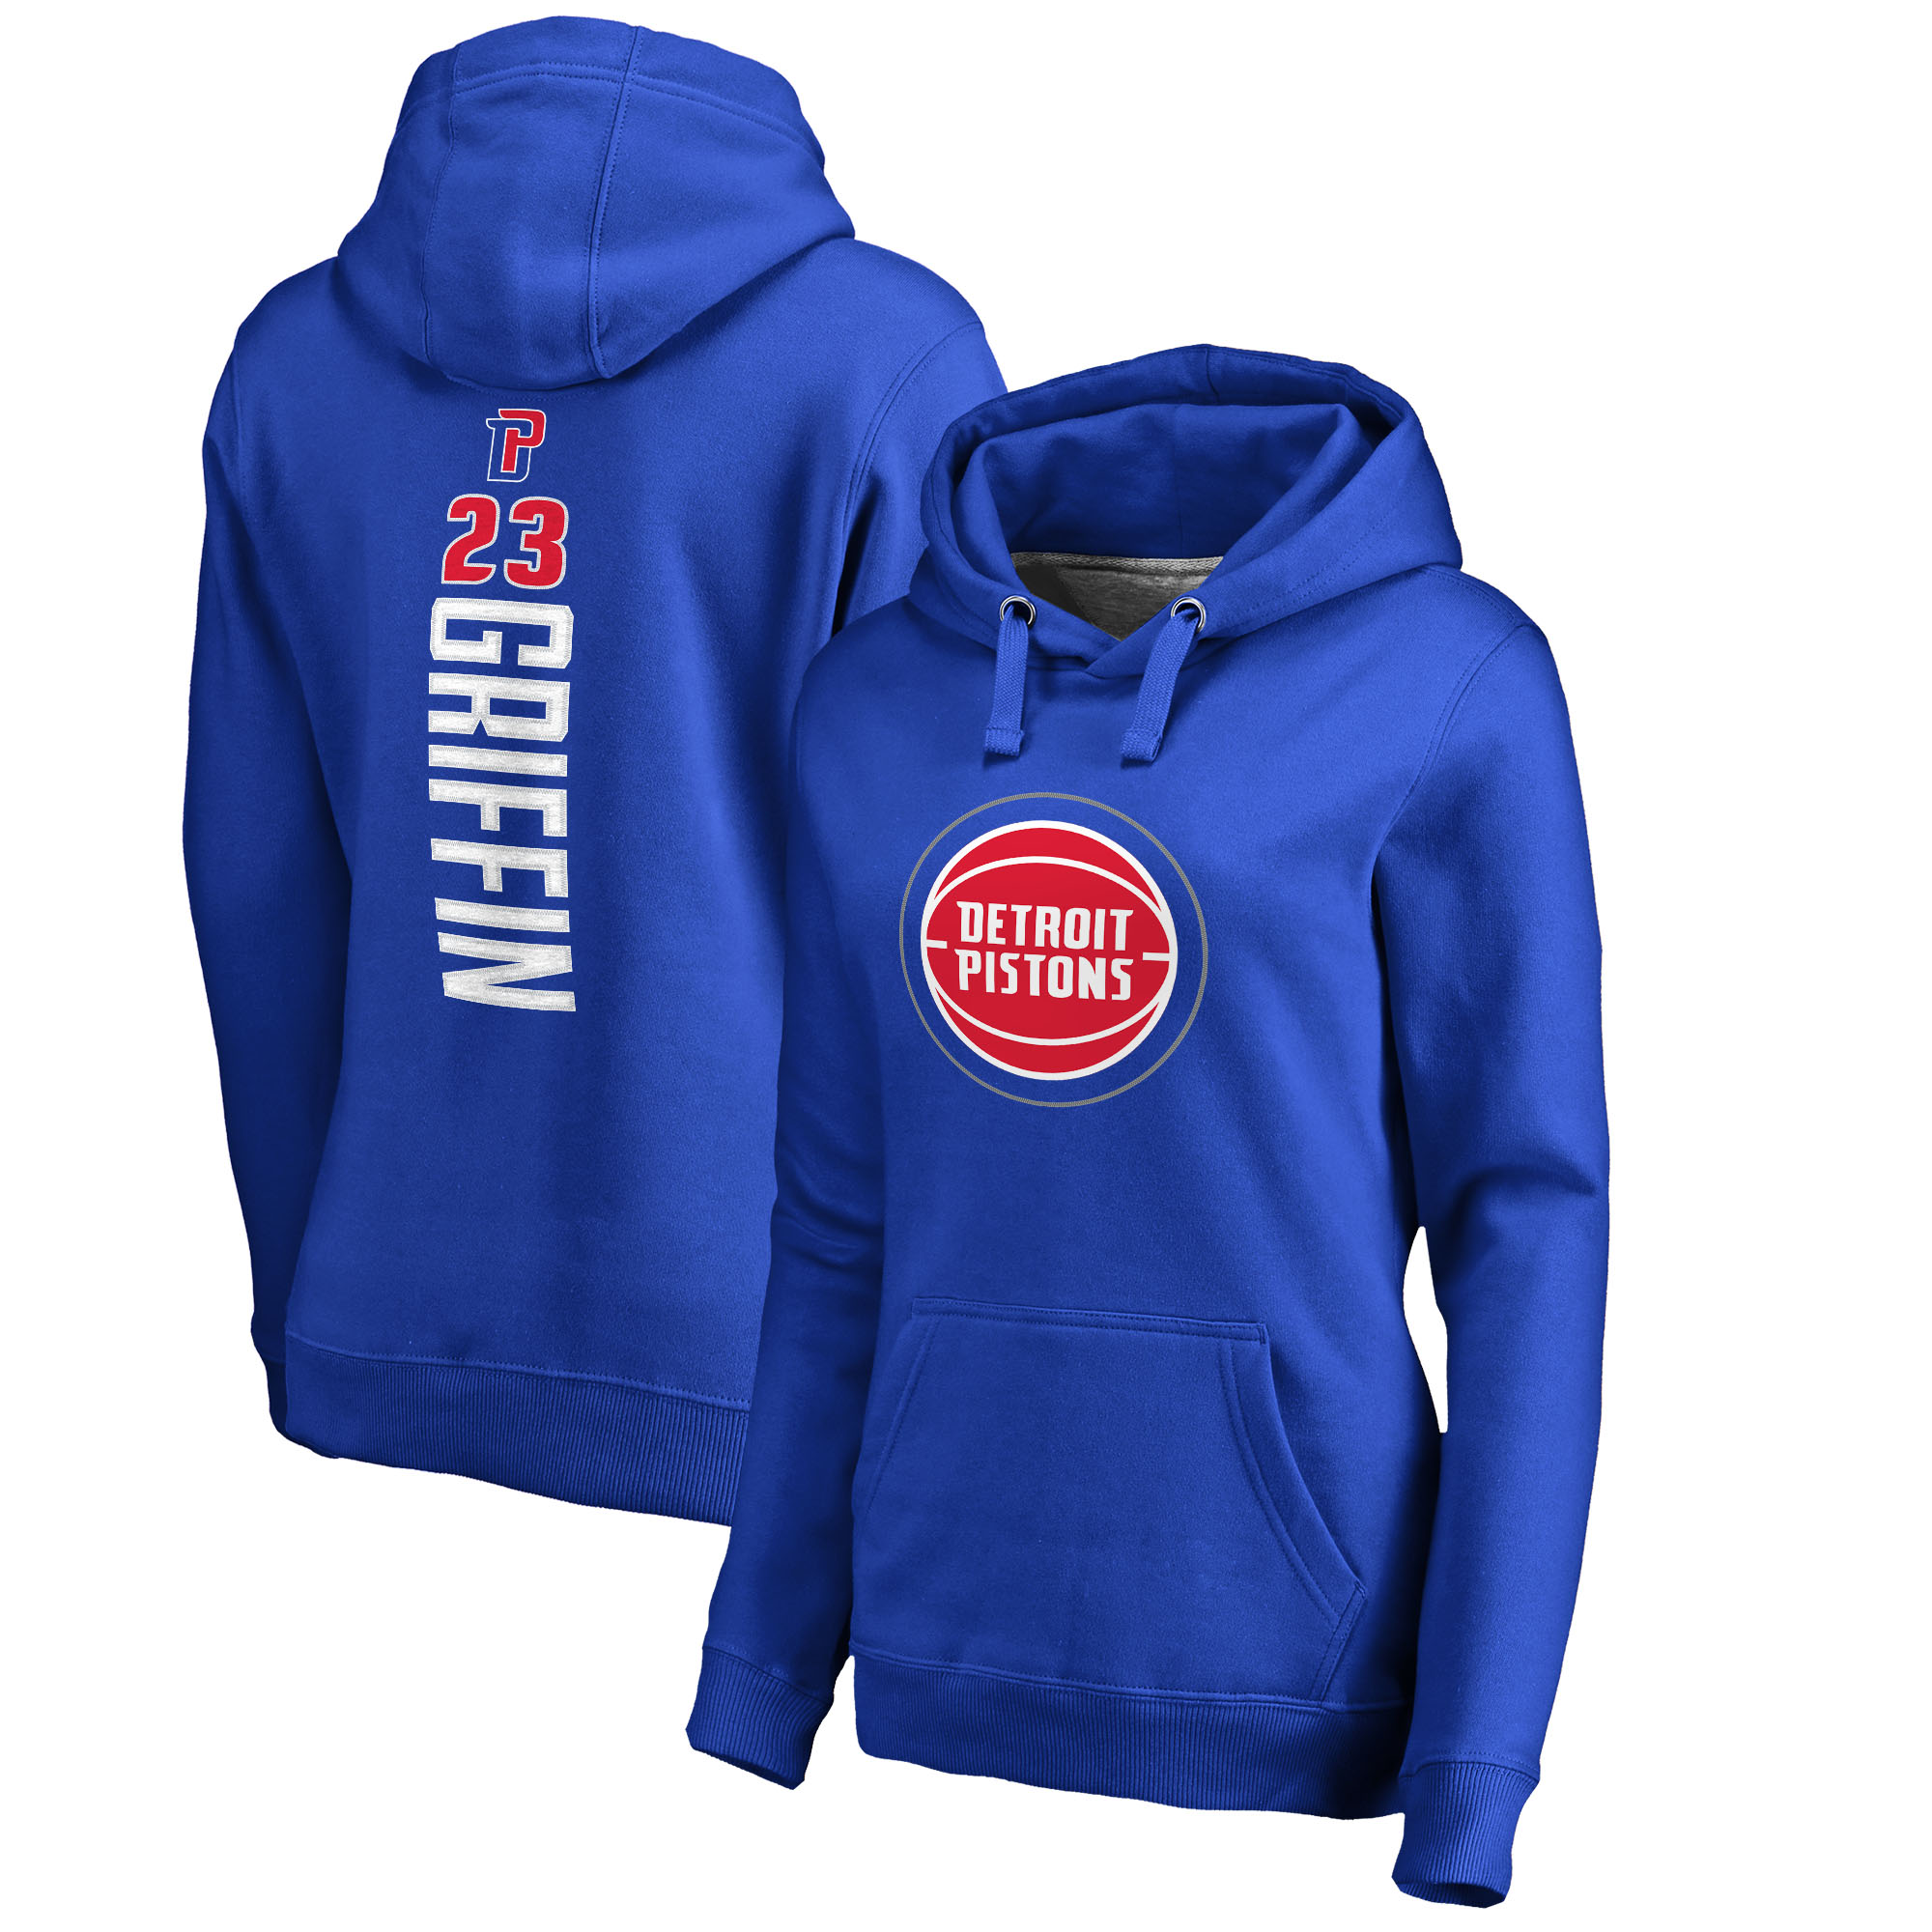 Blake Griffin Detroit Pistons Fanatics Branded Women's Backer Pullover Hoodie - Royal